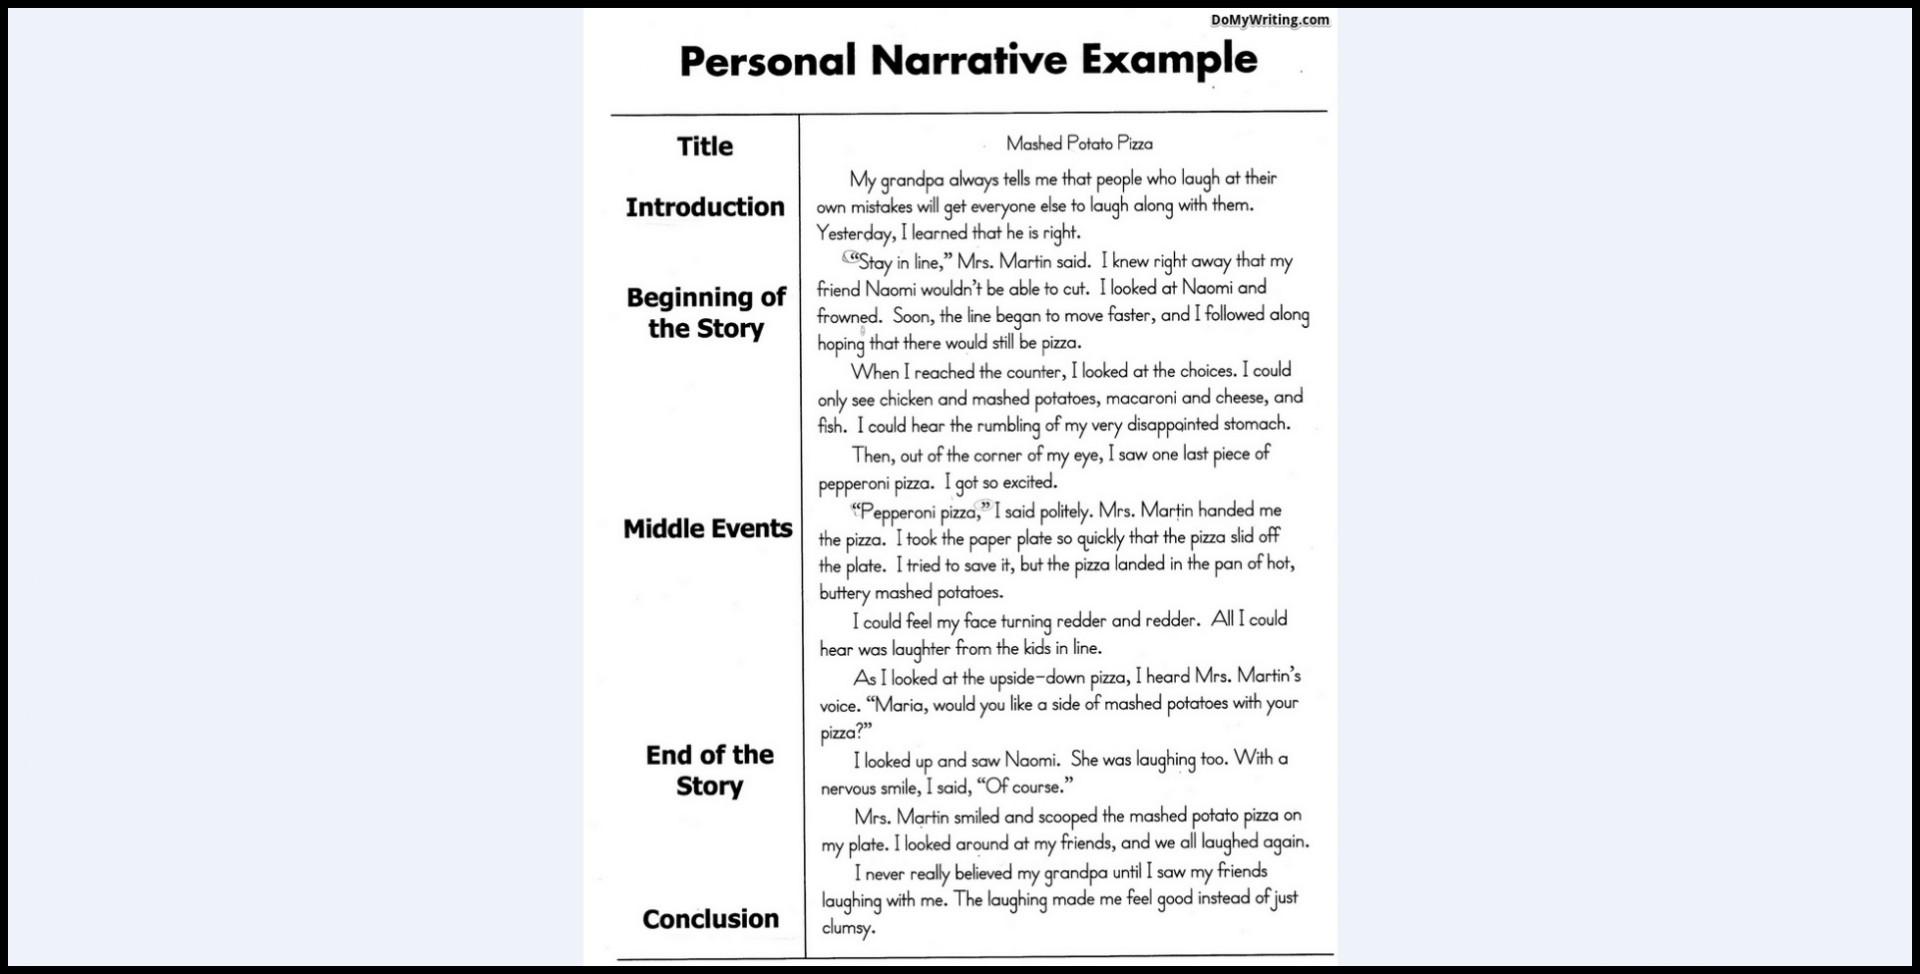 002 Narration Essay Narrative Unbelievable Format College Outline Pdf 1920